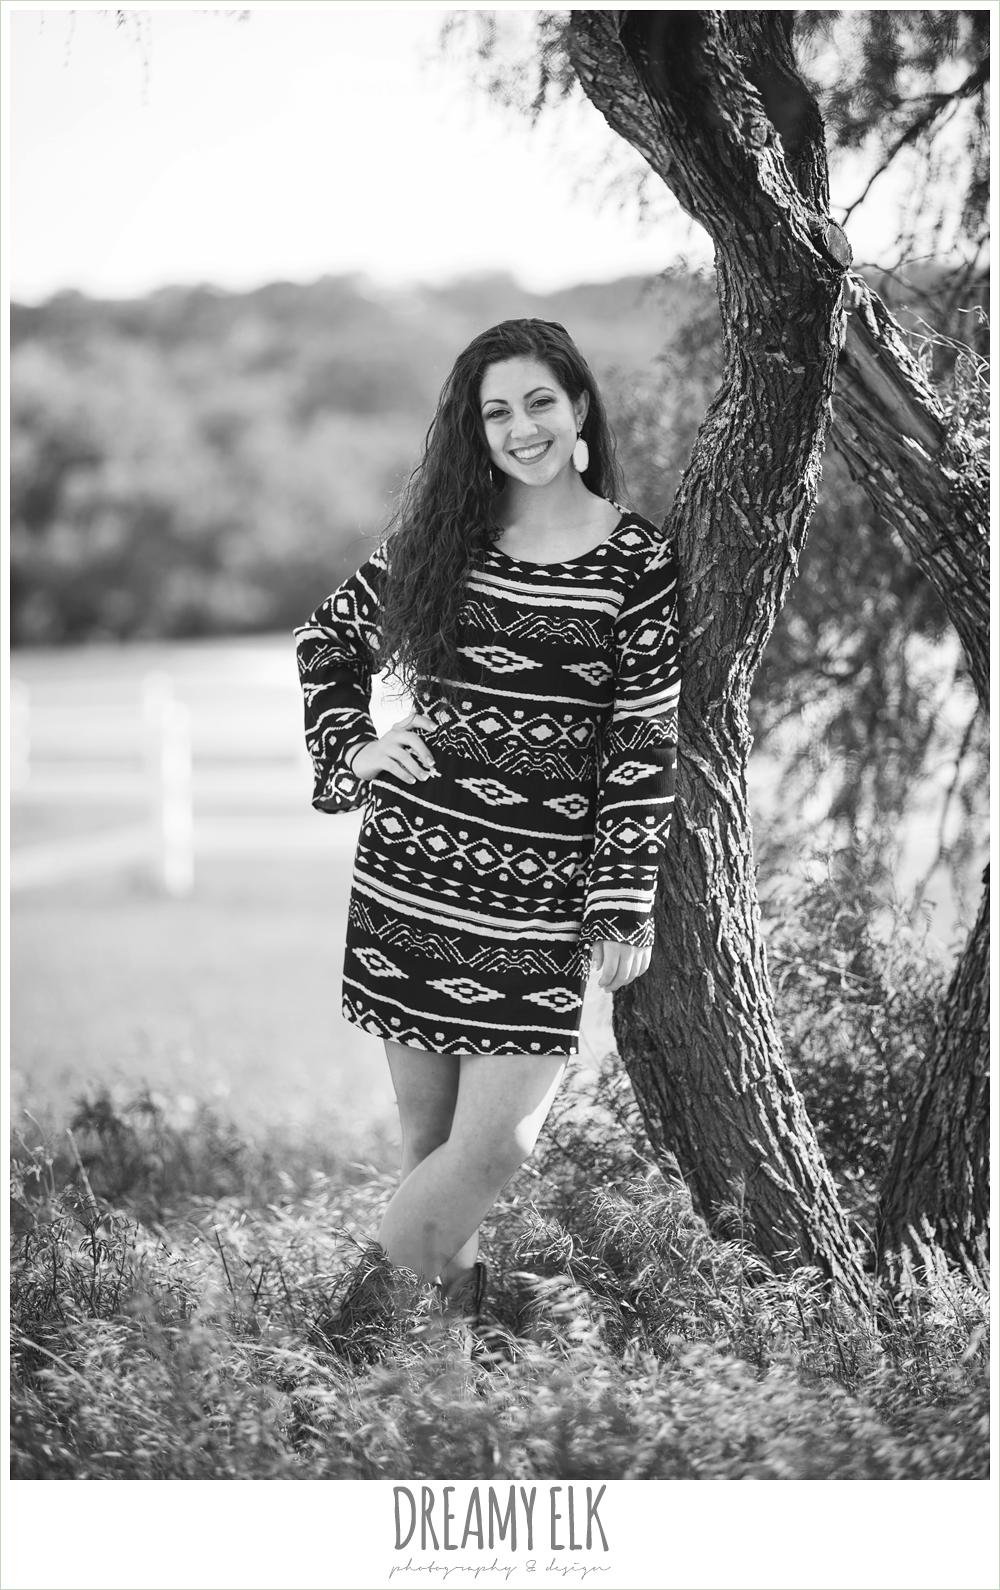 outdoor high school senior photo, austin, texas {dreamy elk photography and design}